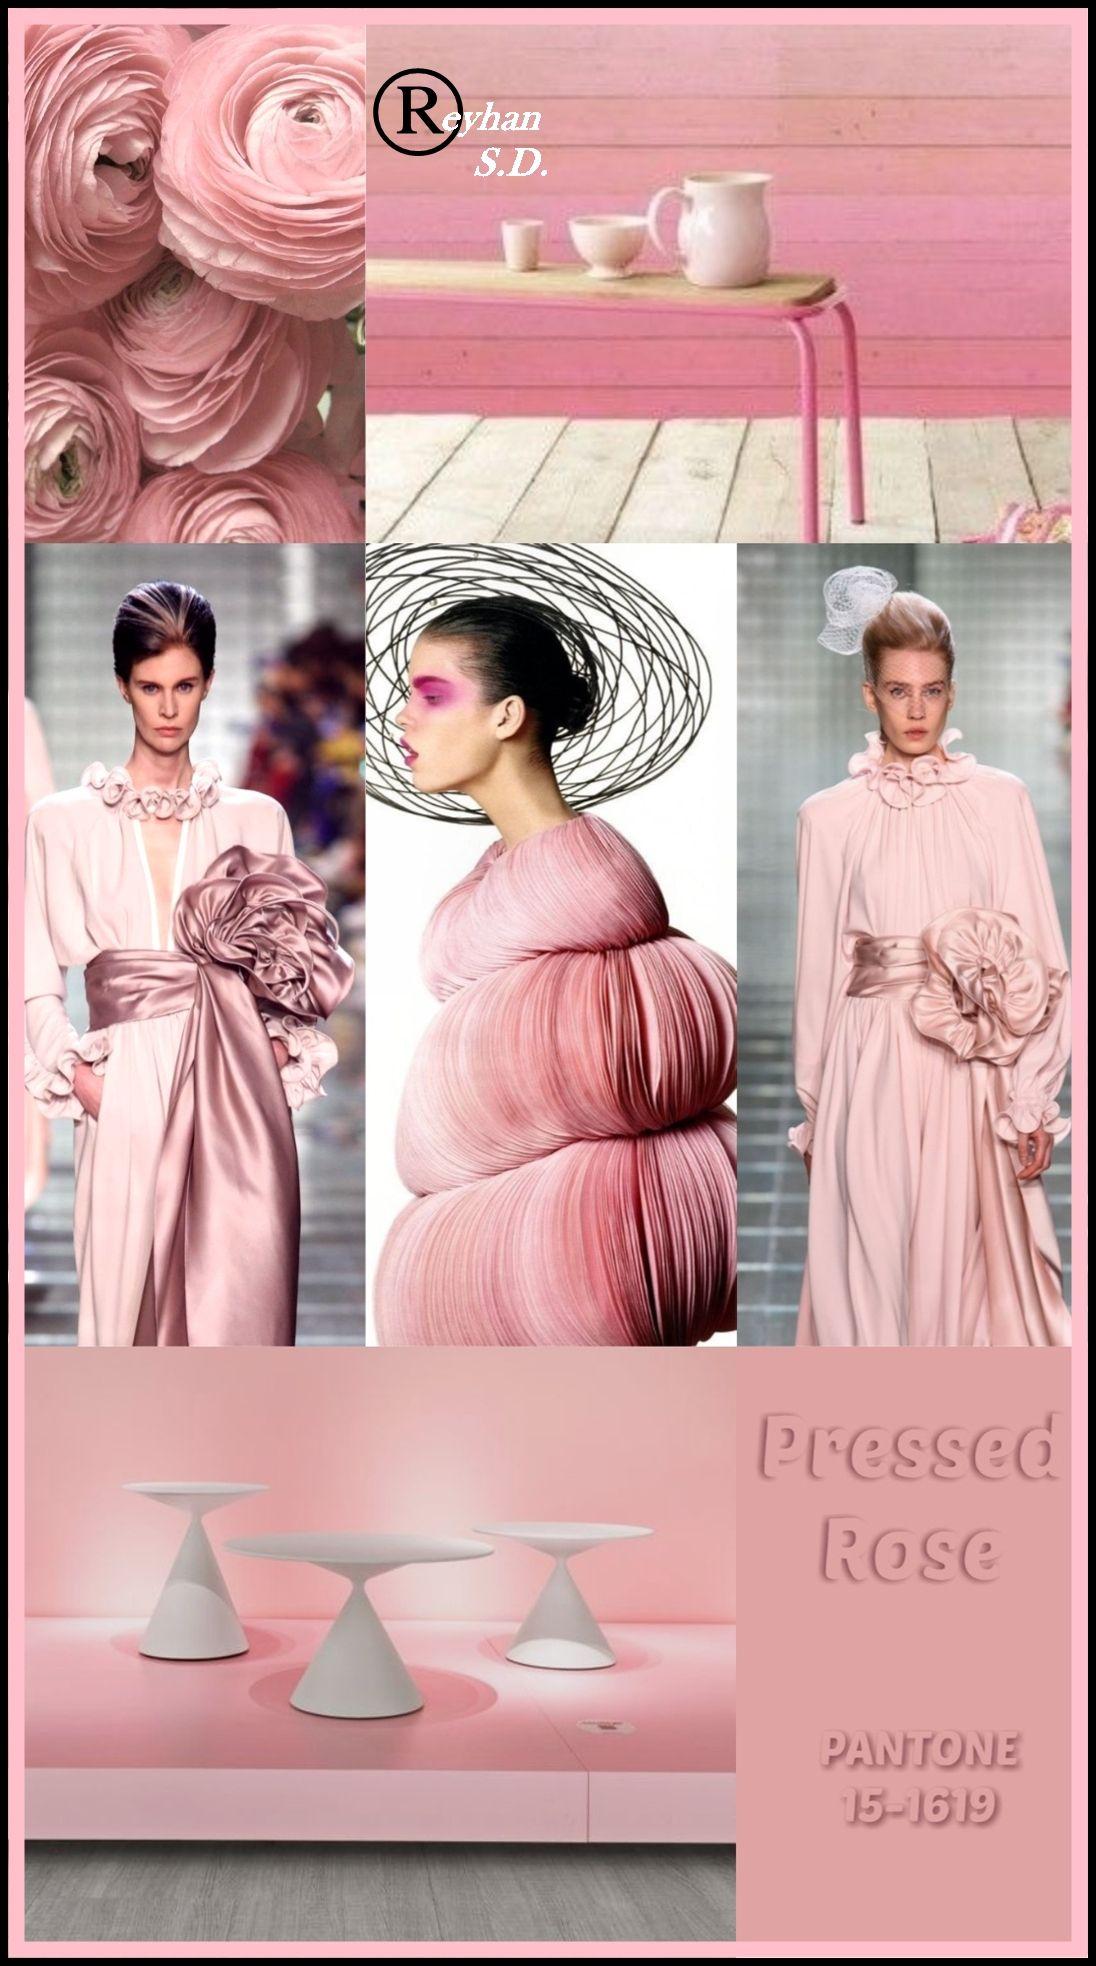 '' Pressed Rose - Pantone Spring/ Summer 2019 Color '' by Reyhan S.D.